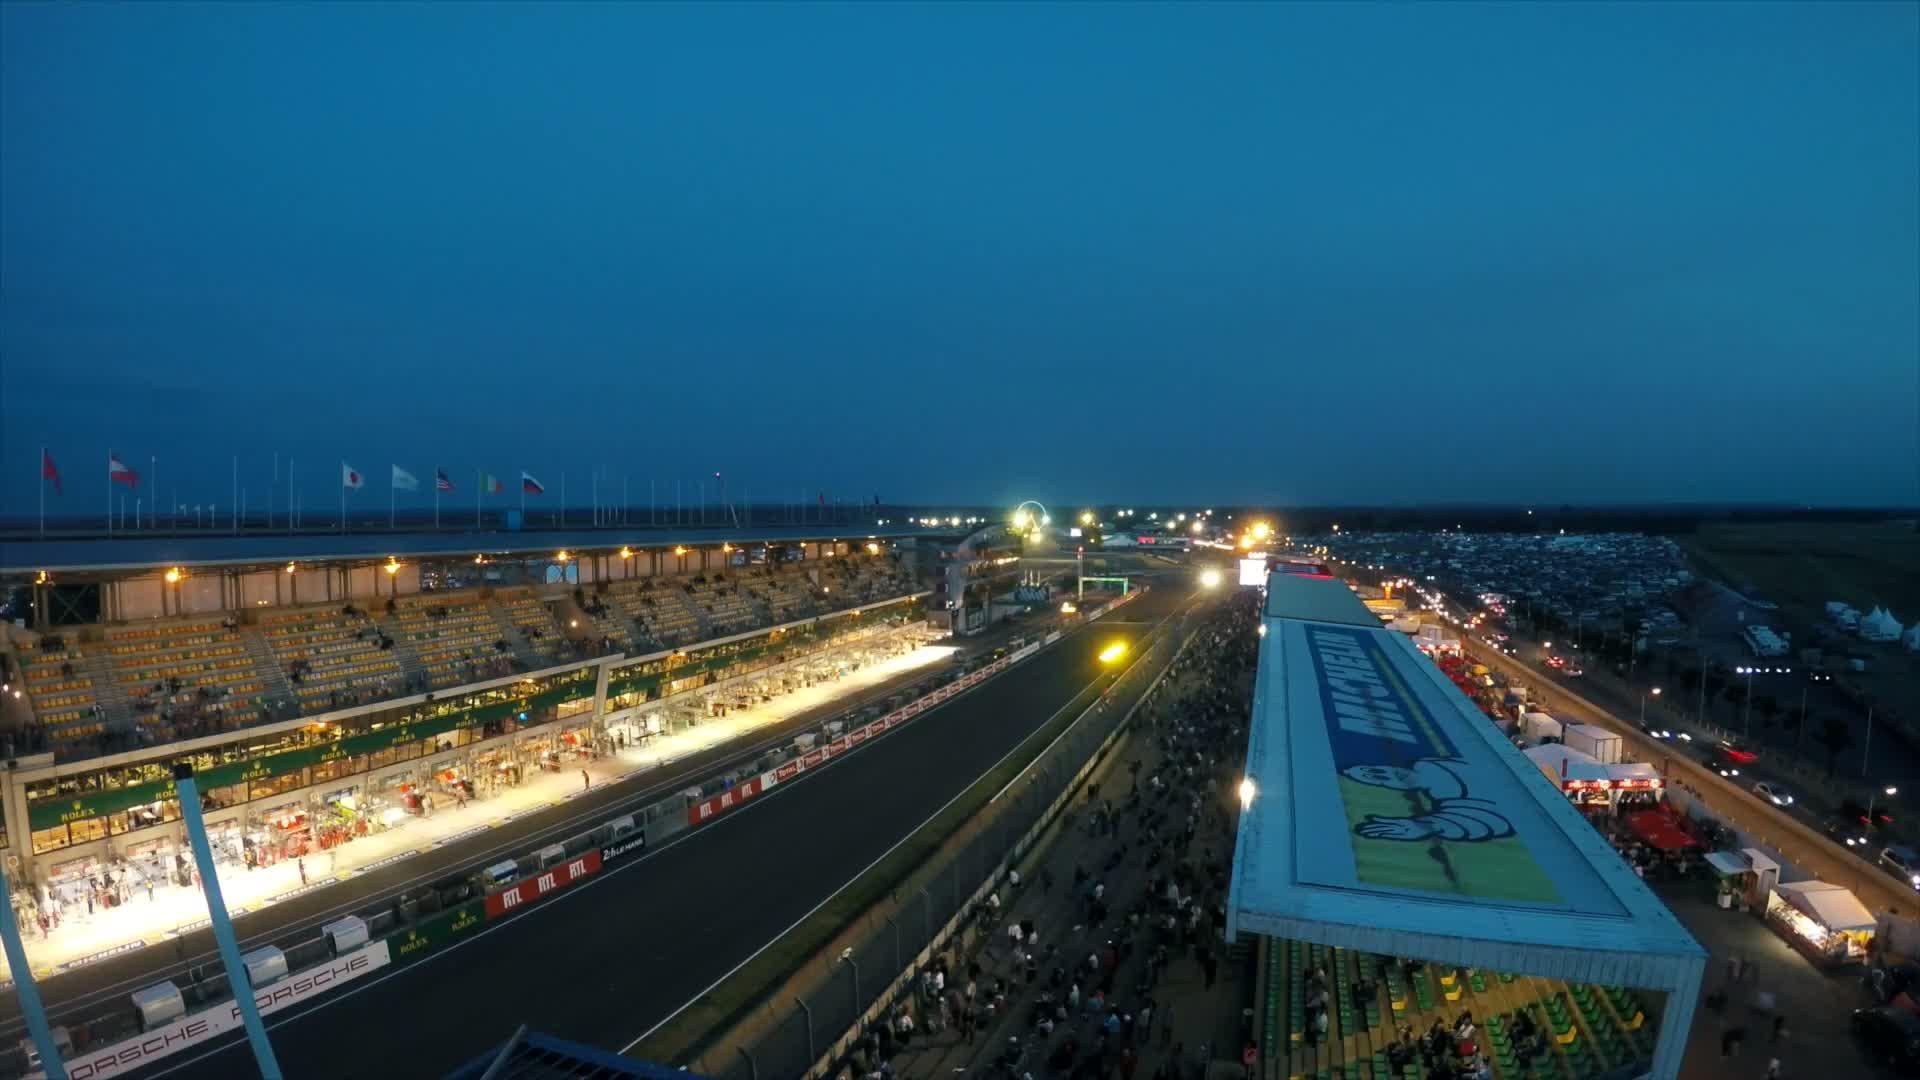 Le Mans - Audi schnell, aber glücklos